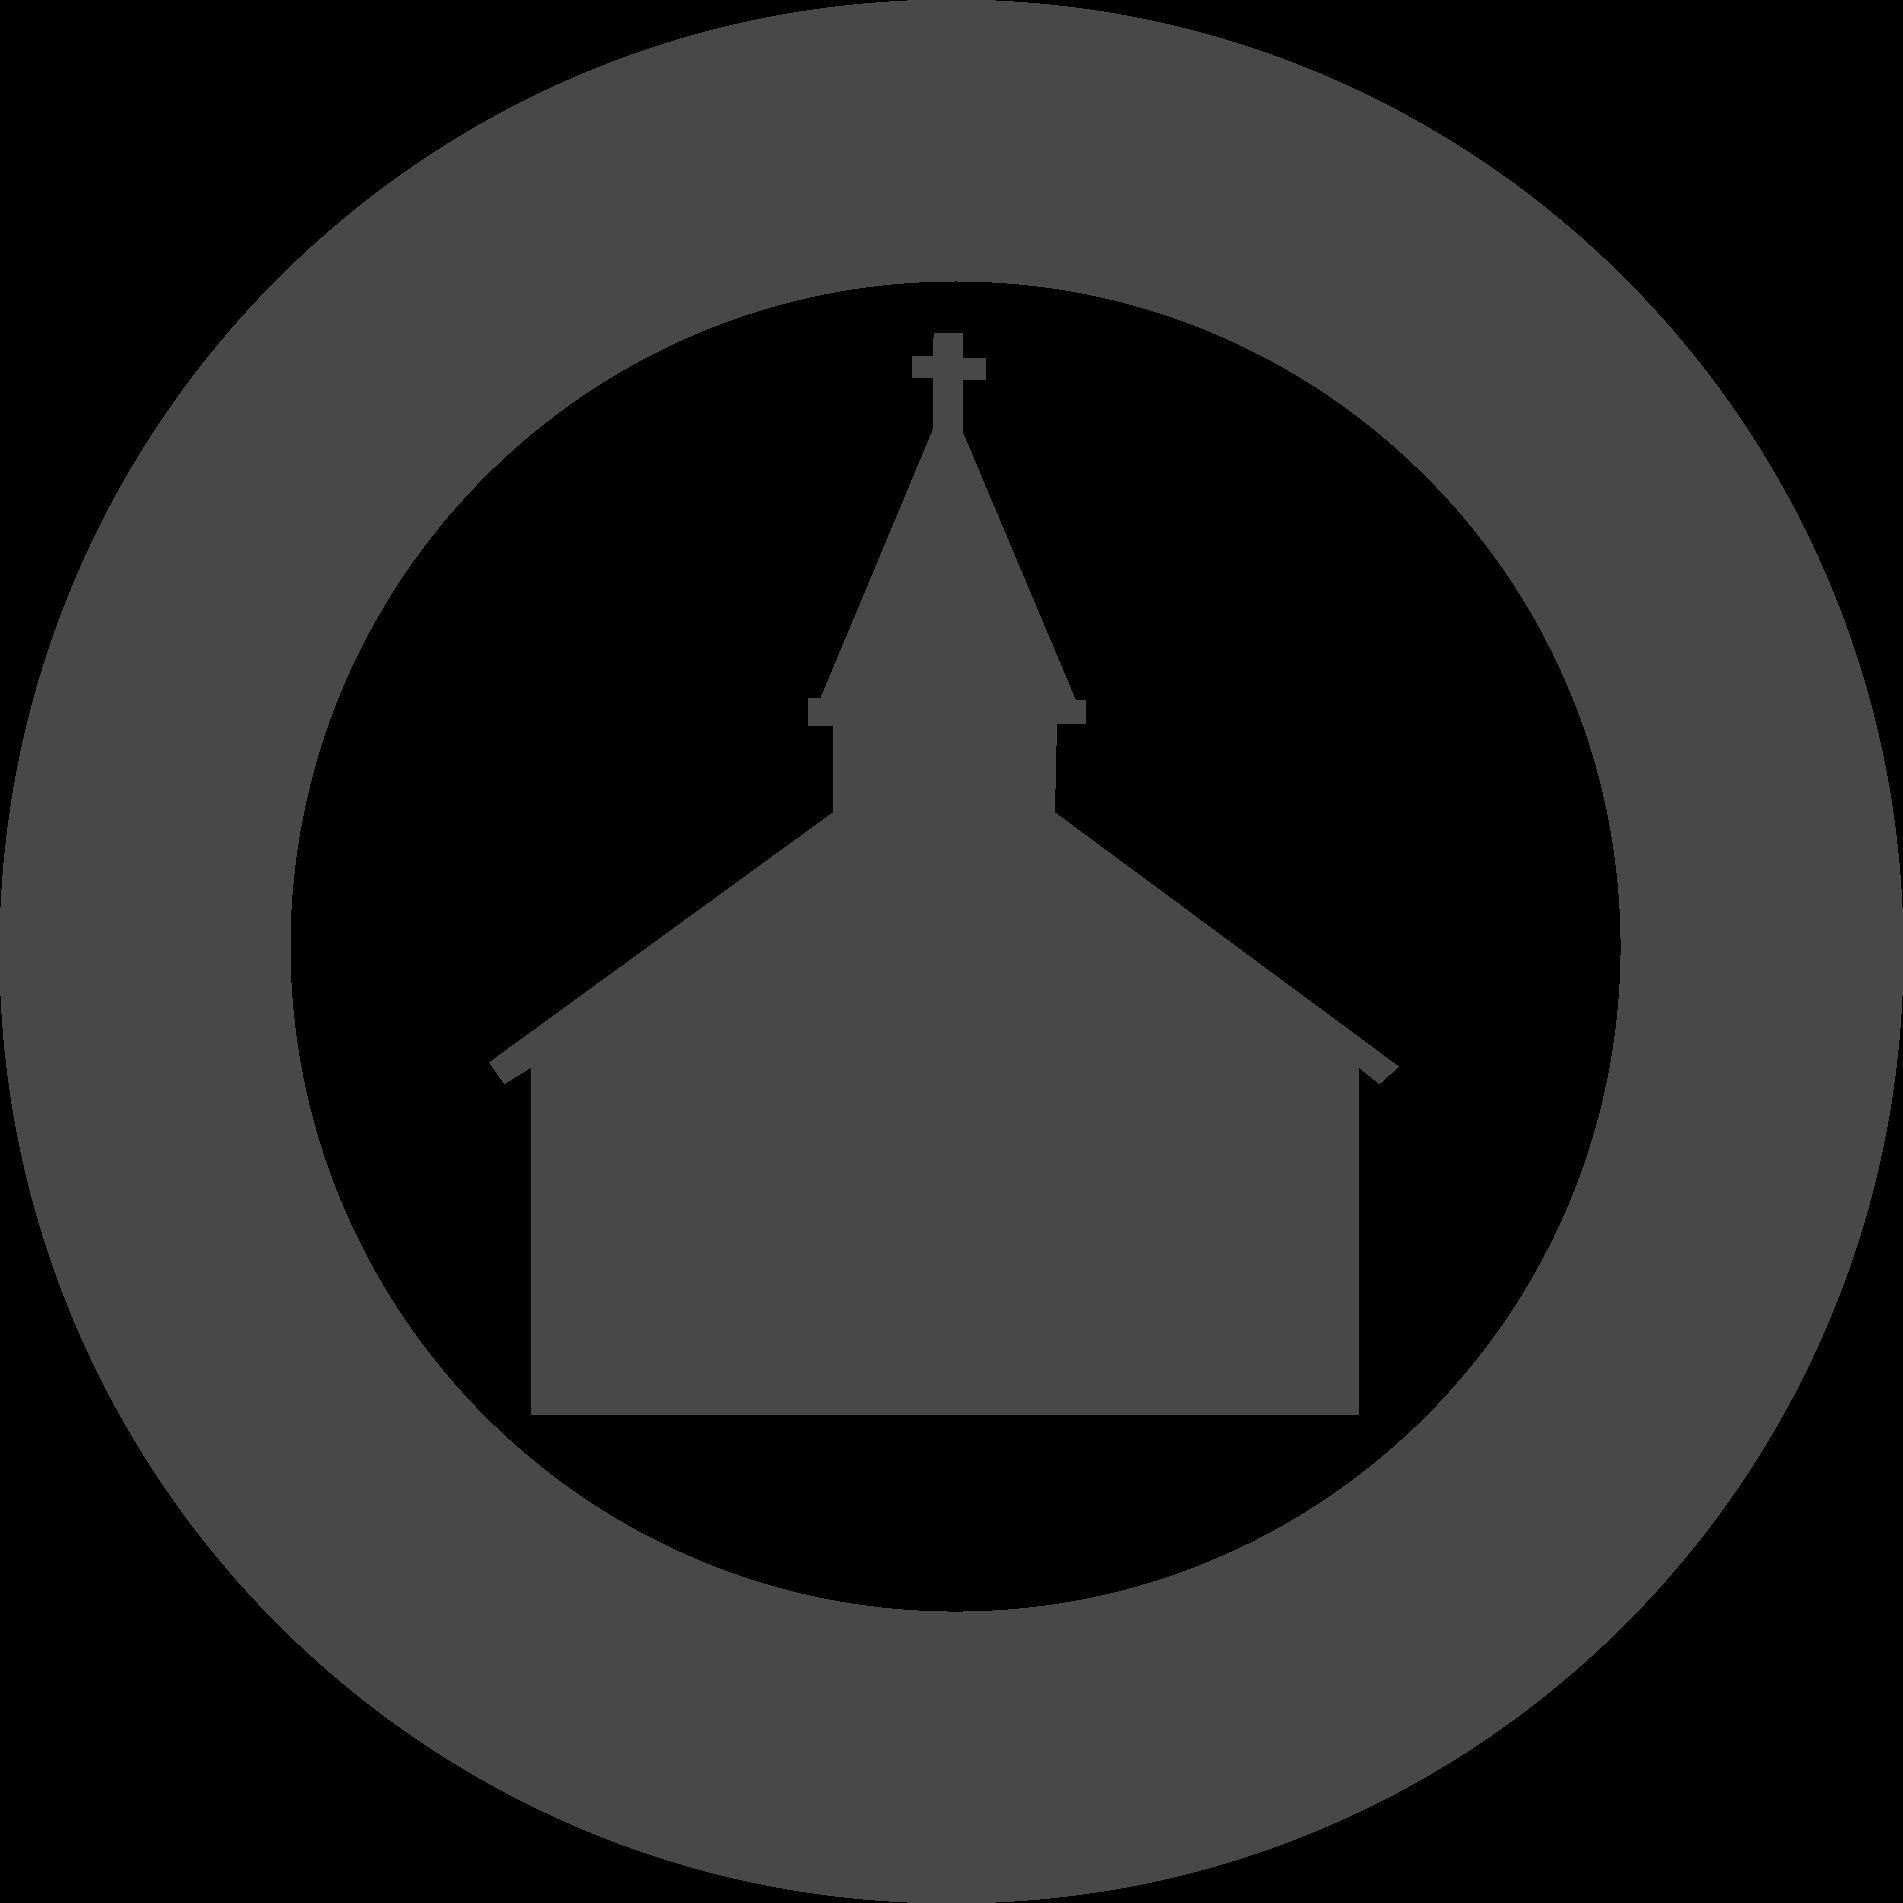 FoundationFocus_logos_gray_church.png